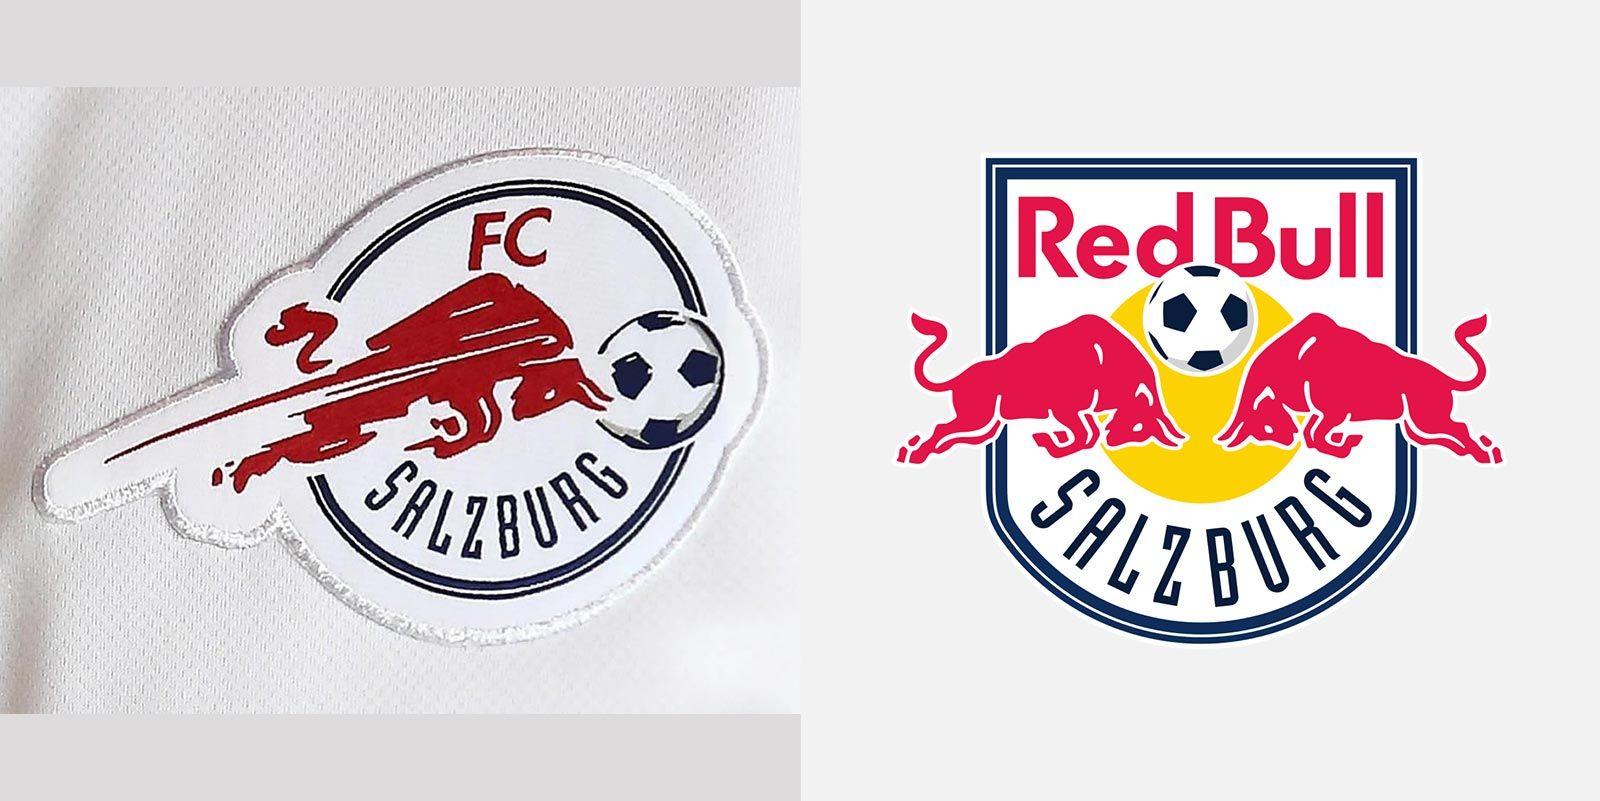 All New Red Bull Salzburg   Champions League Kits Logo Revealed Footy Headlines Branding Sport Pinterest Salzburg Champions League And Logos